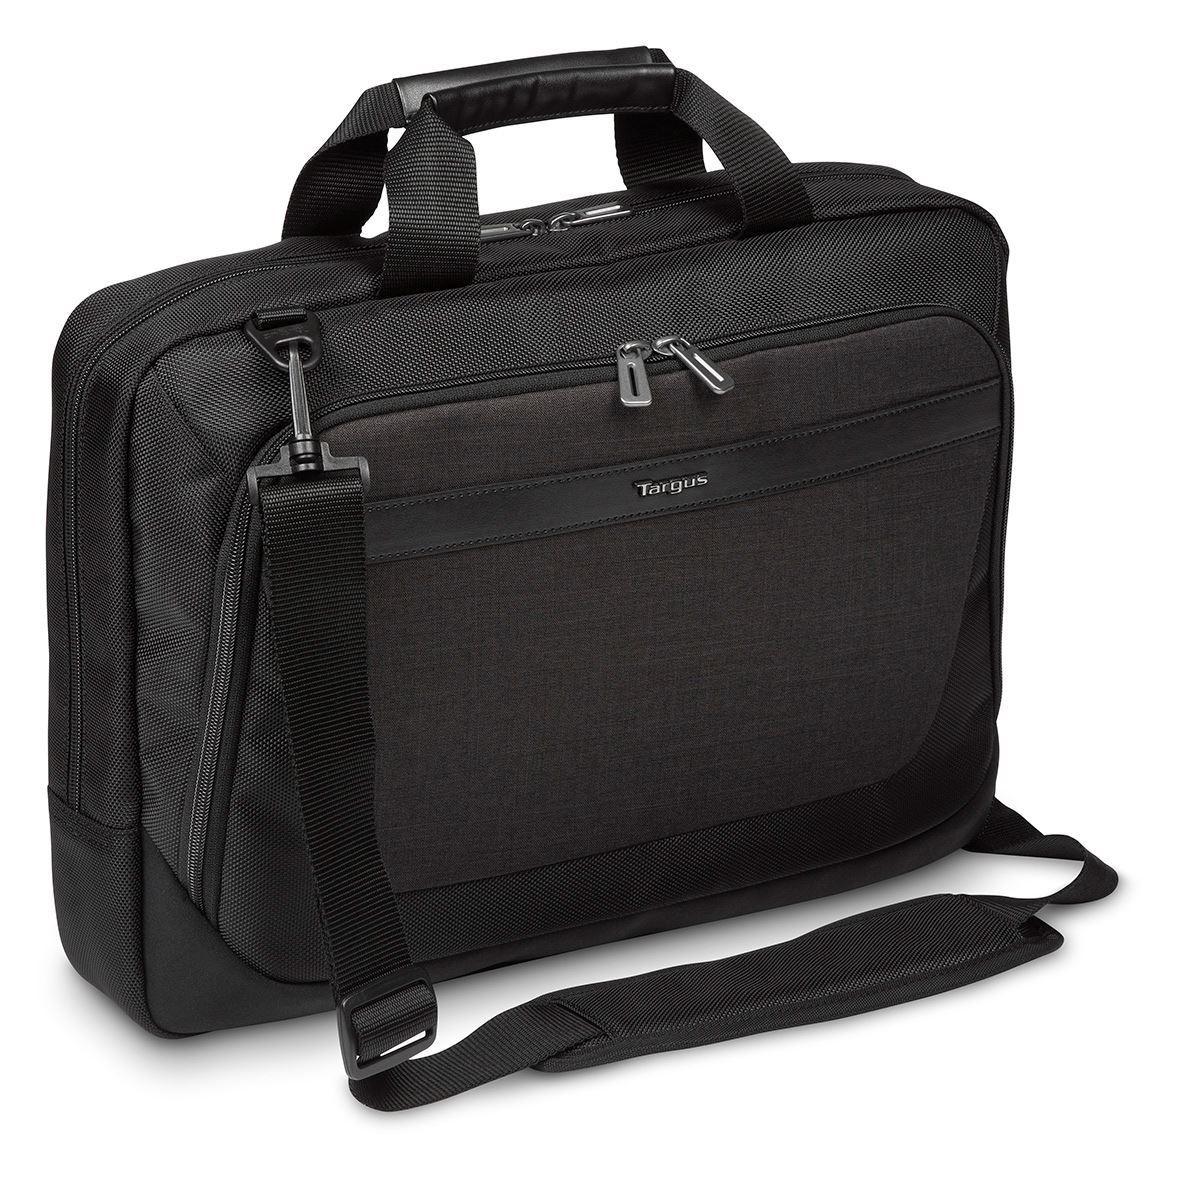 Torba na notebook CitySmart 14-15. 6 SlimLine Topload czarny/szary